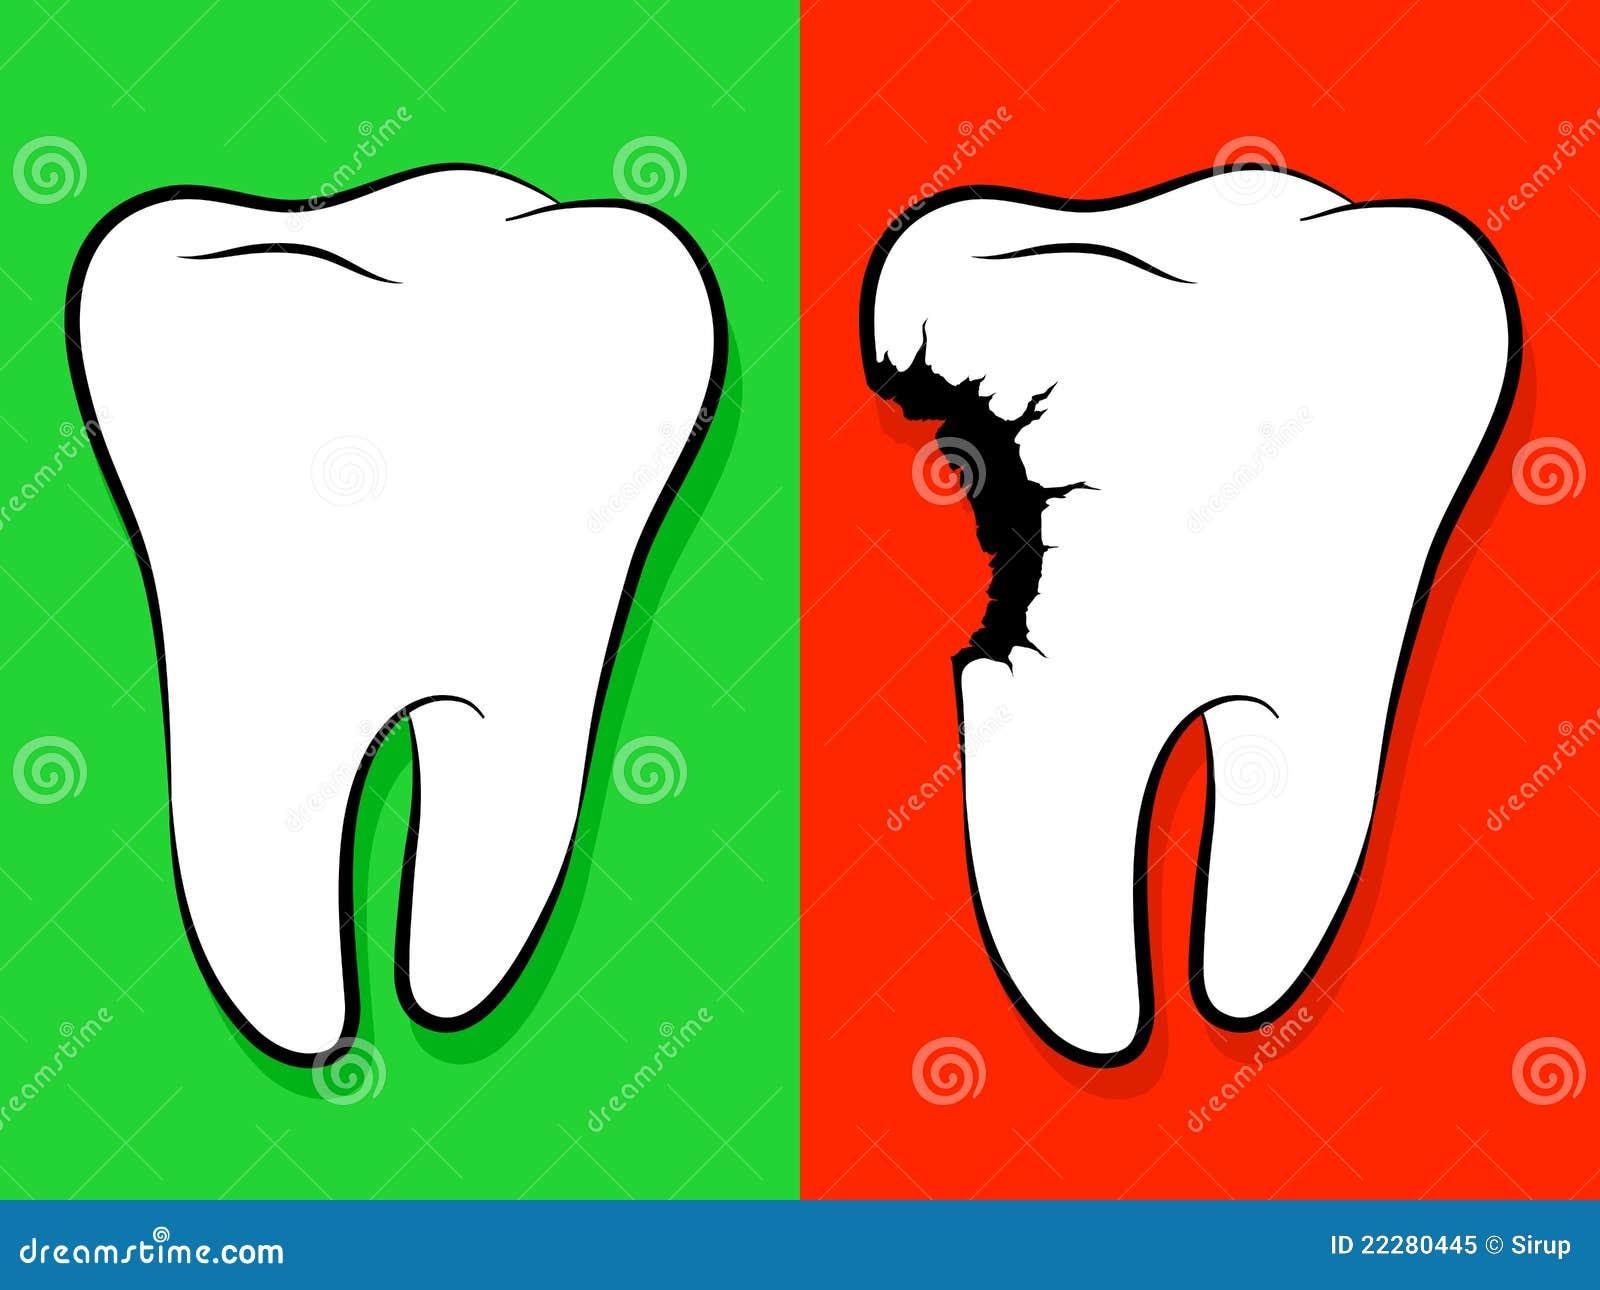 Carie saine et malsaine de dessin anim de dent photo - Dessin de dent ...